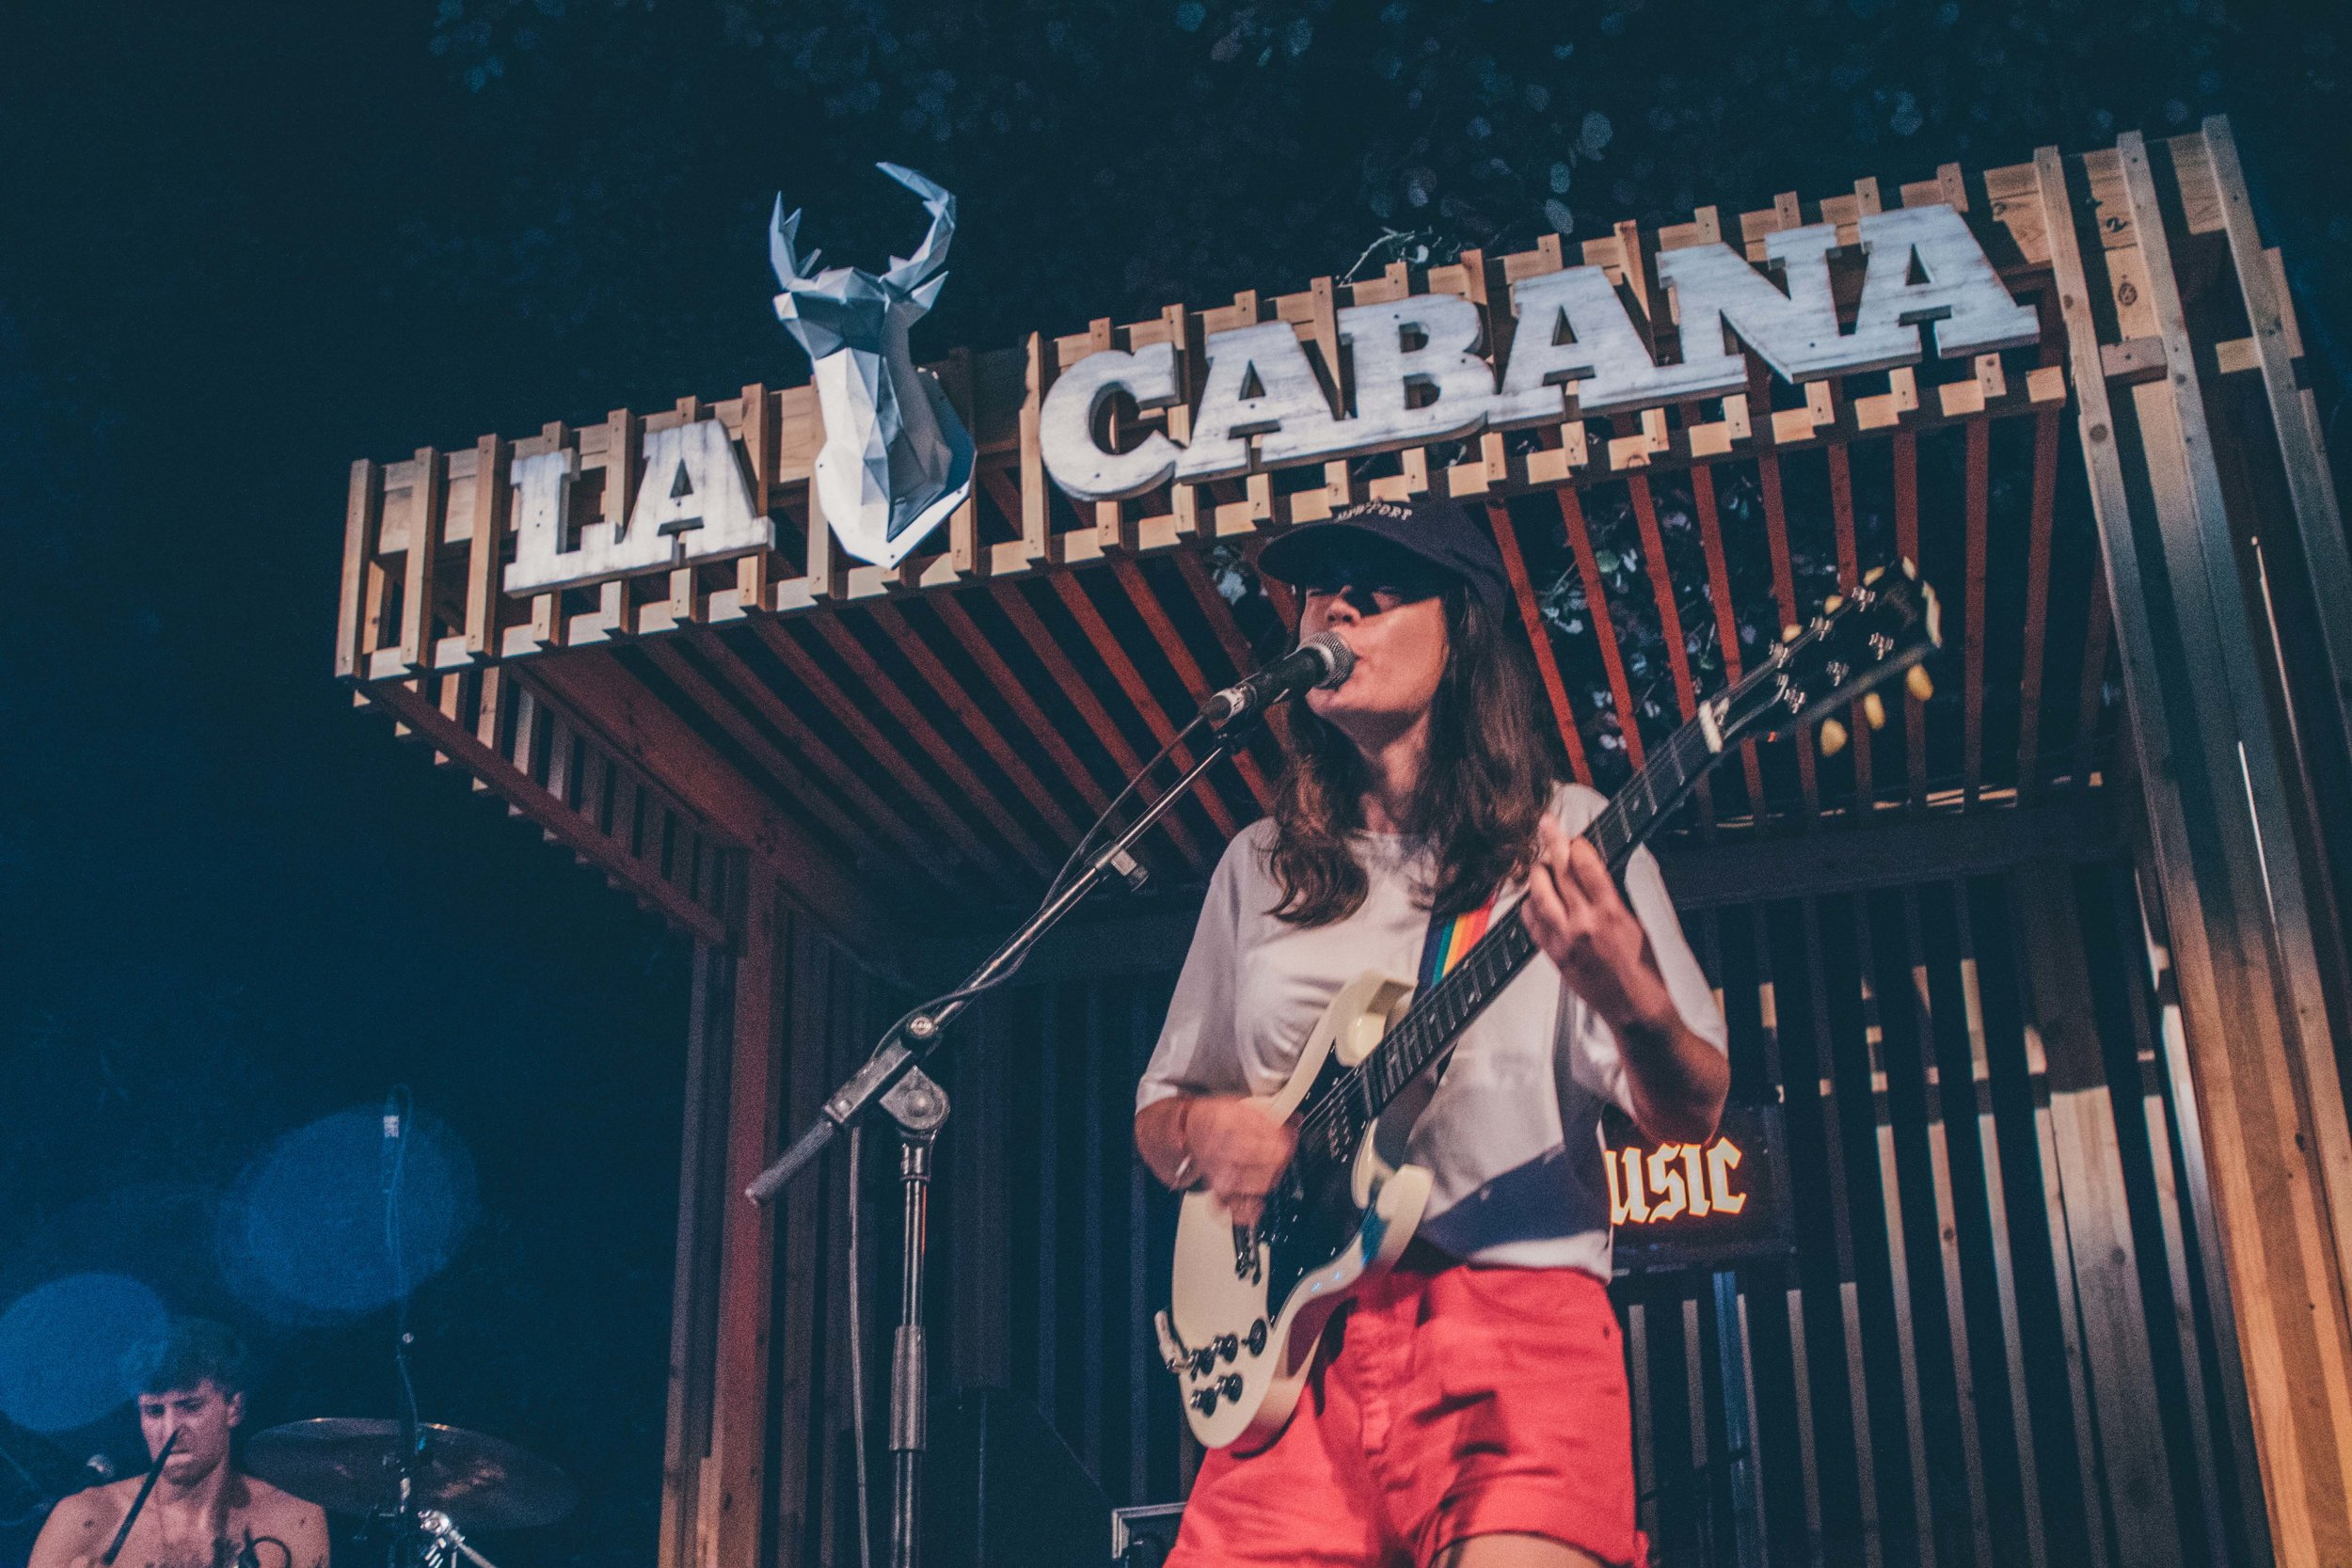 Yawners, Vida Festival, La Masia d'en Cabanyes, Vilanova i La Geltrú, 05-07-2019_3_1.jpg